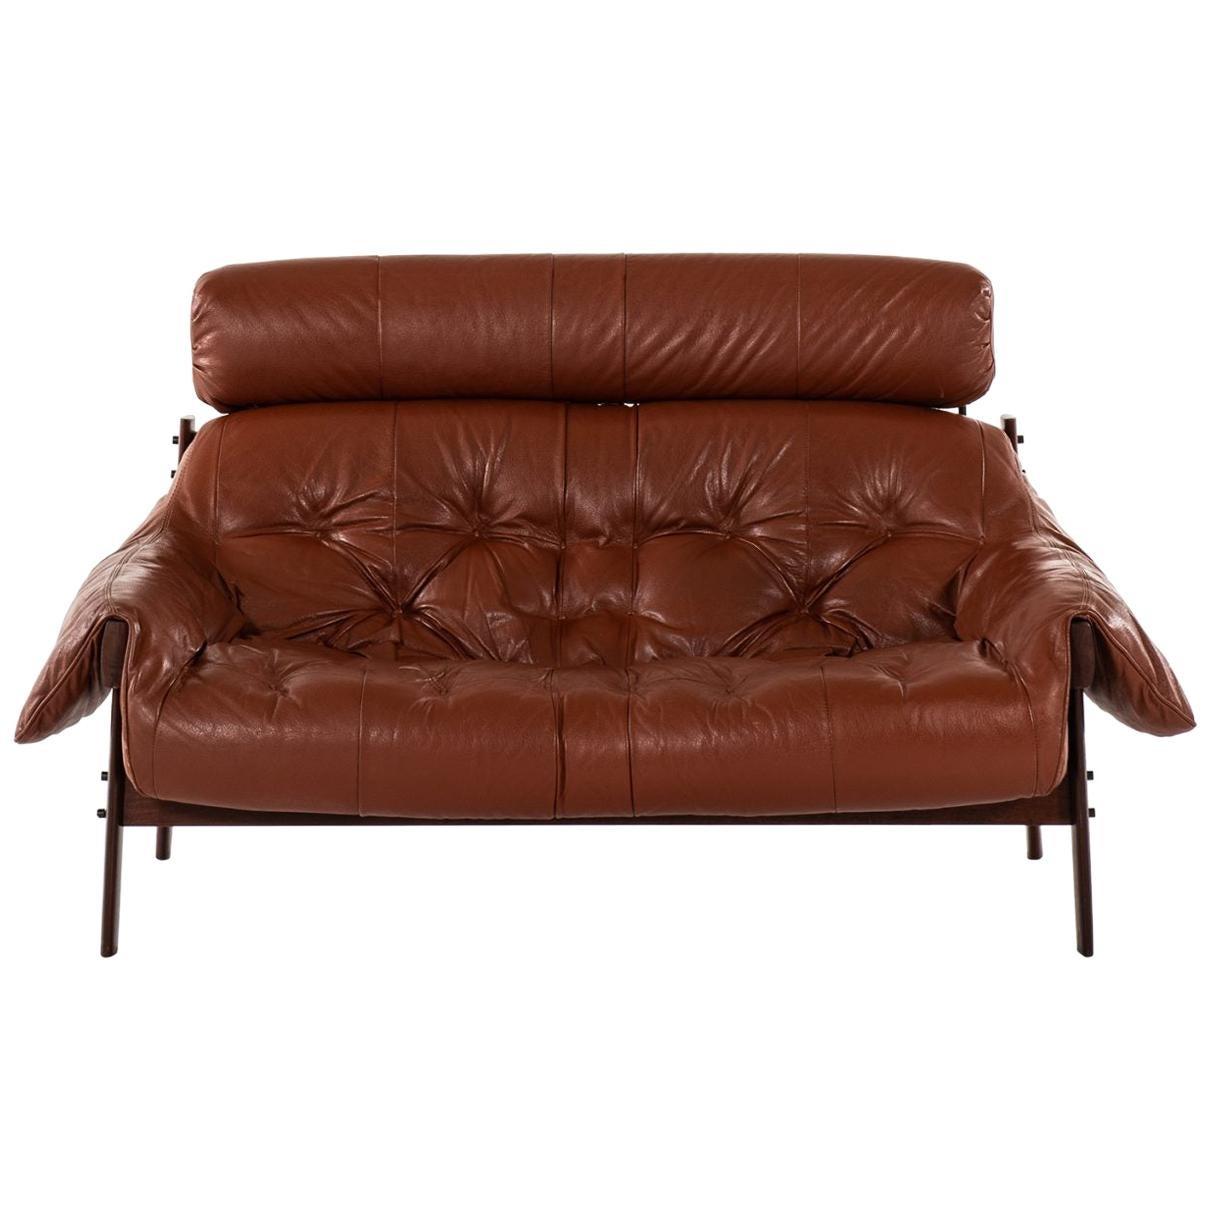 Percival Lafer Sofa Produced by Lafer MP in Brazil